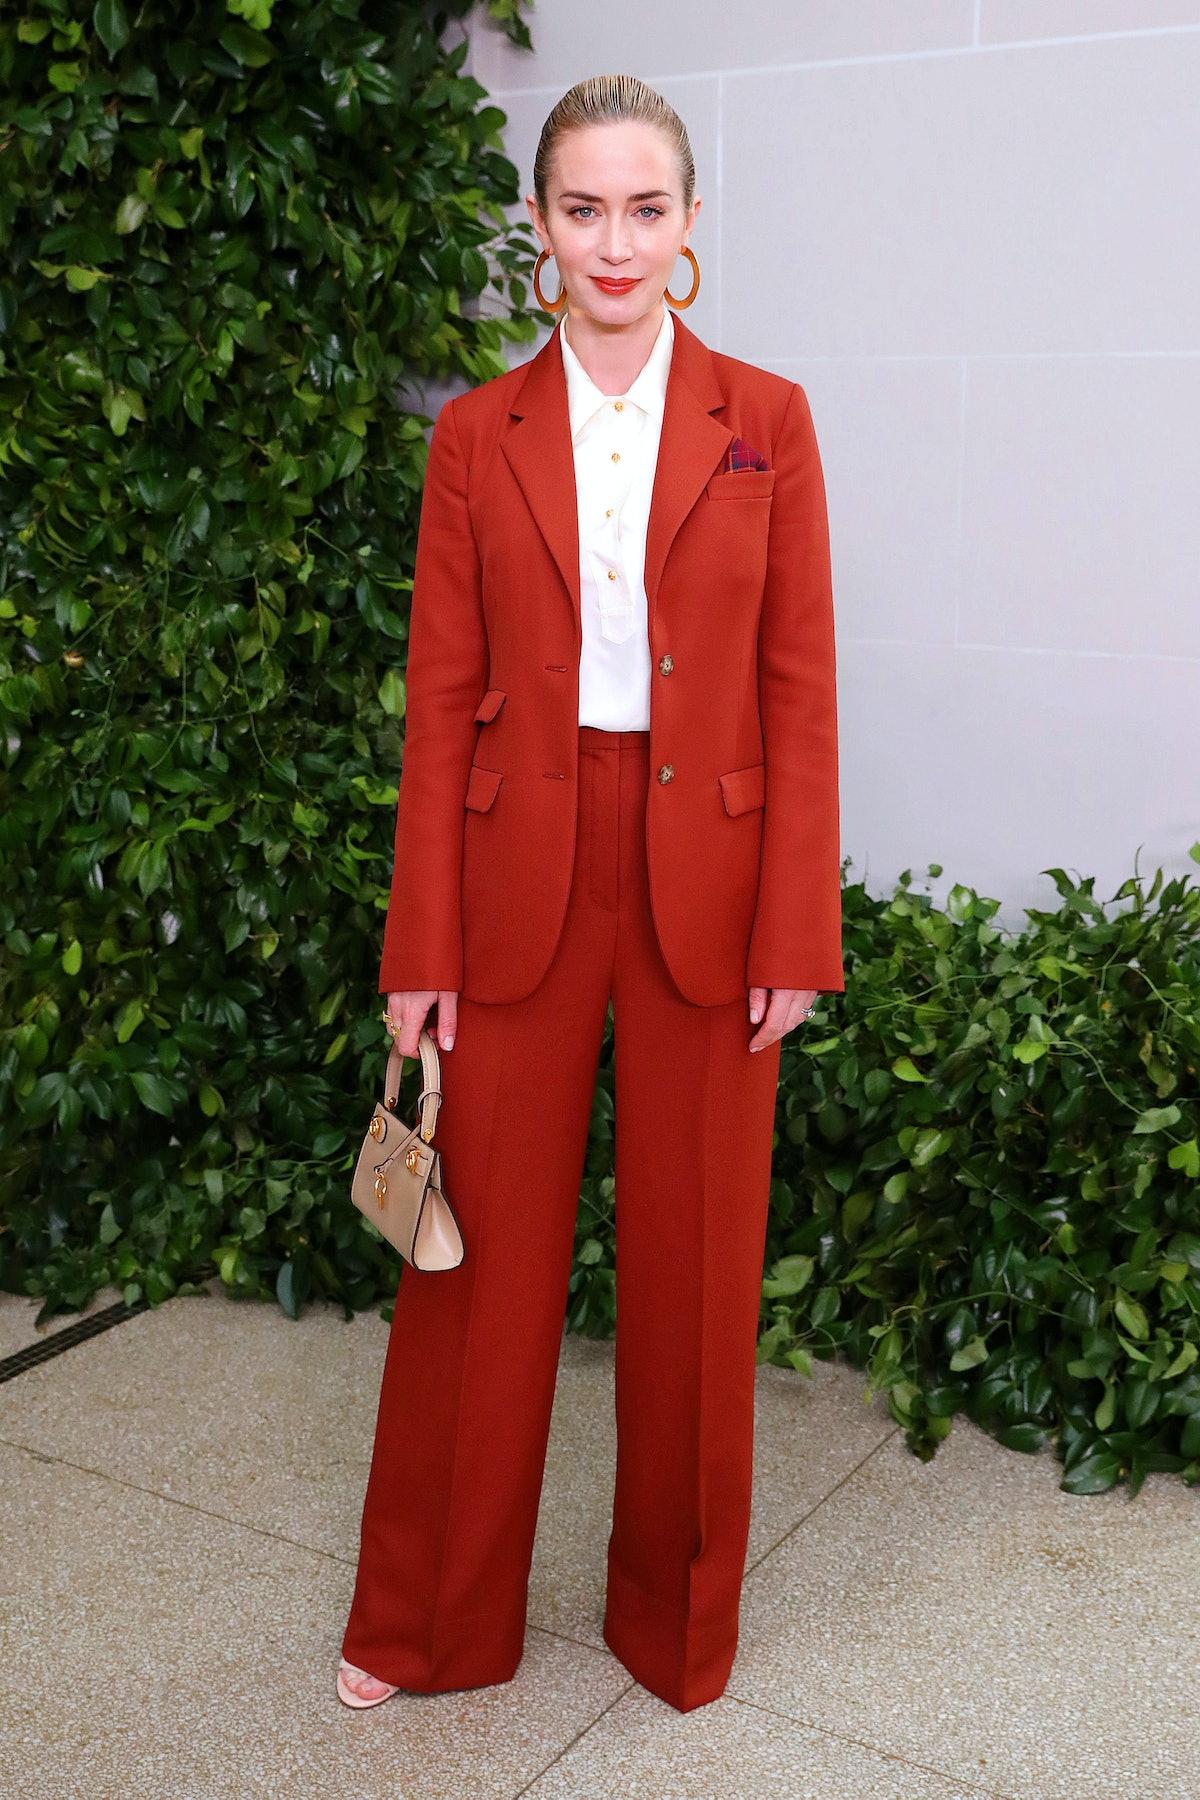 Emily Blunt in a blood orange suit.